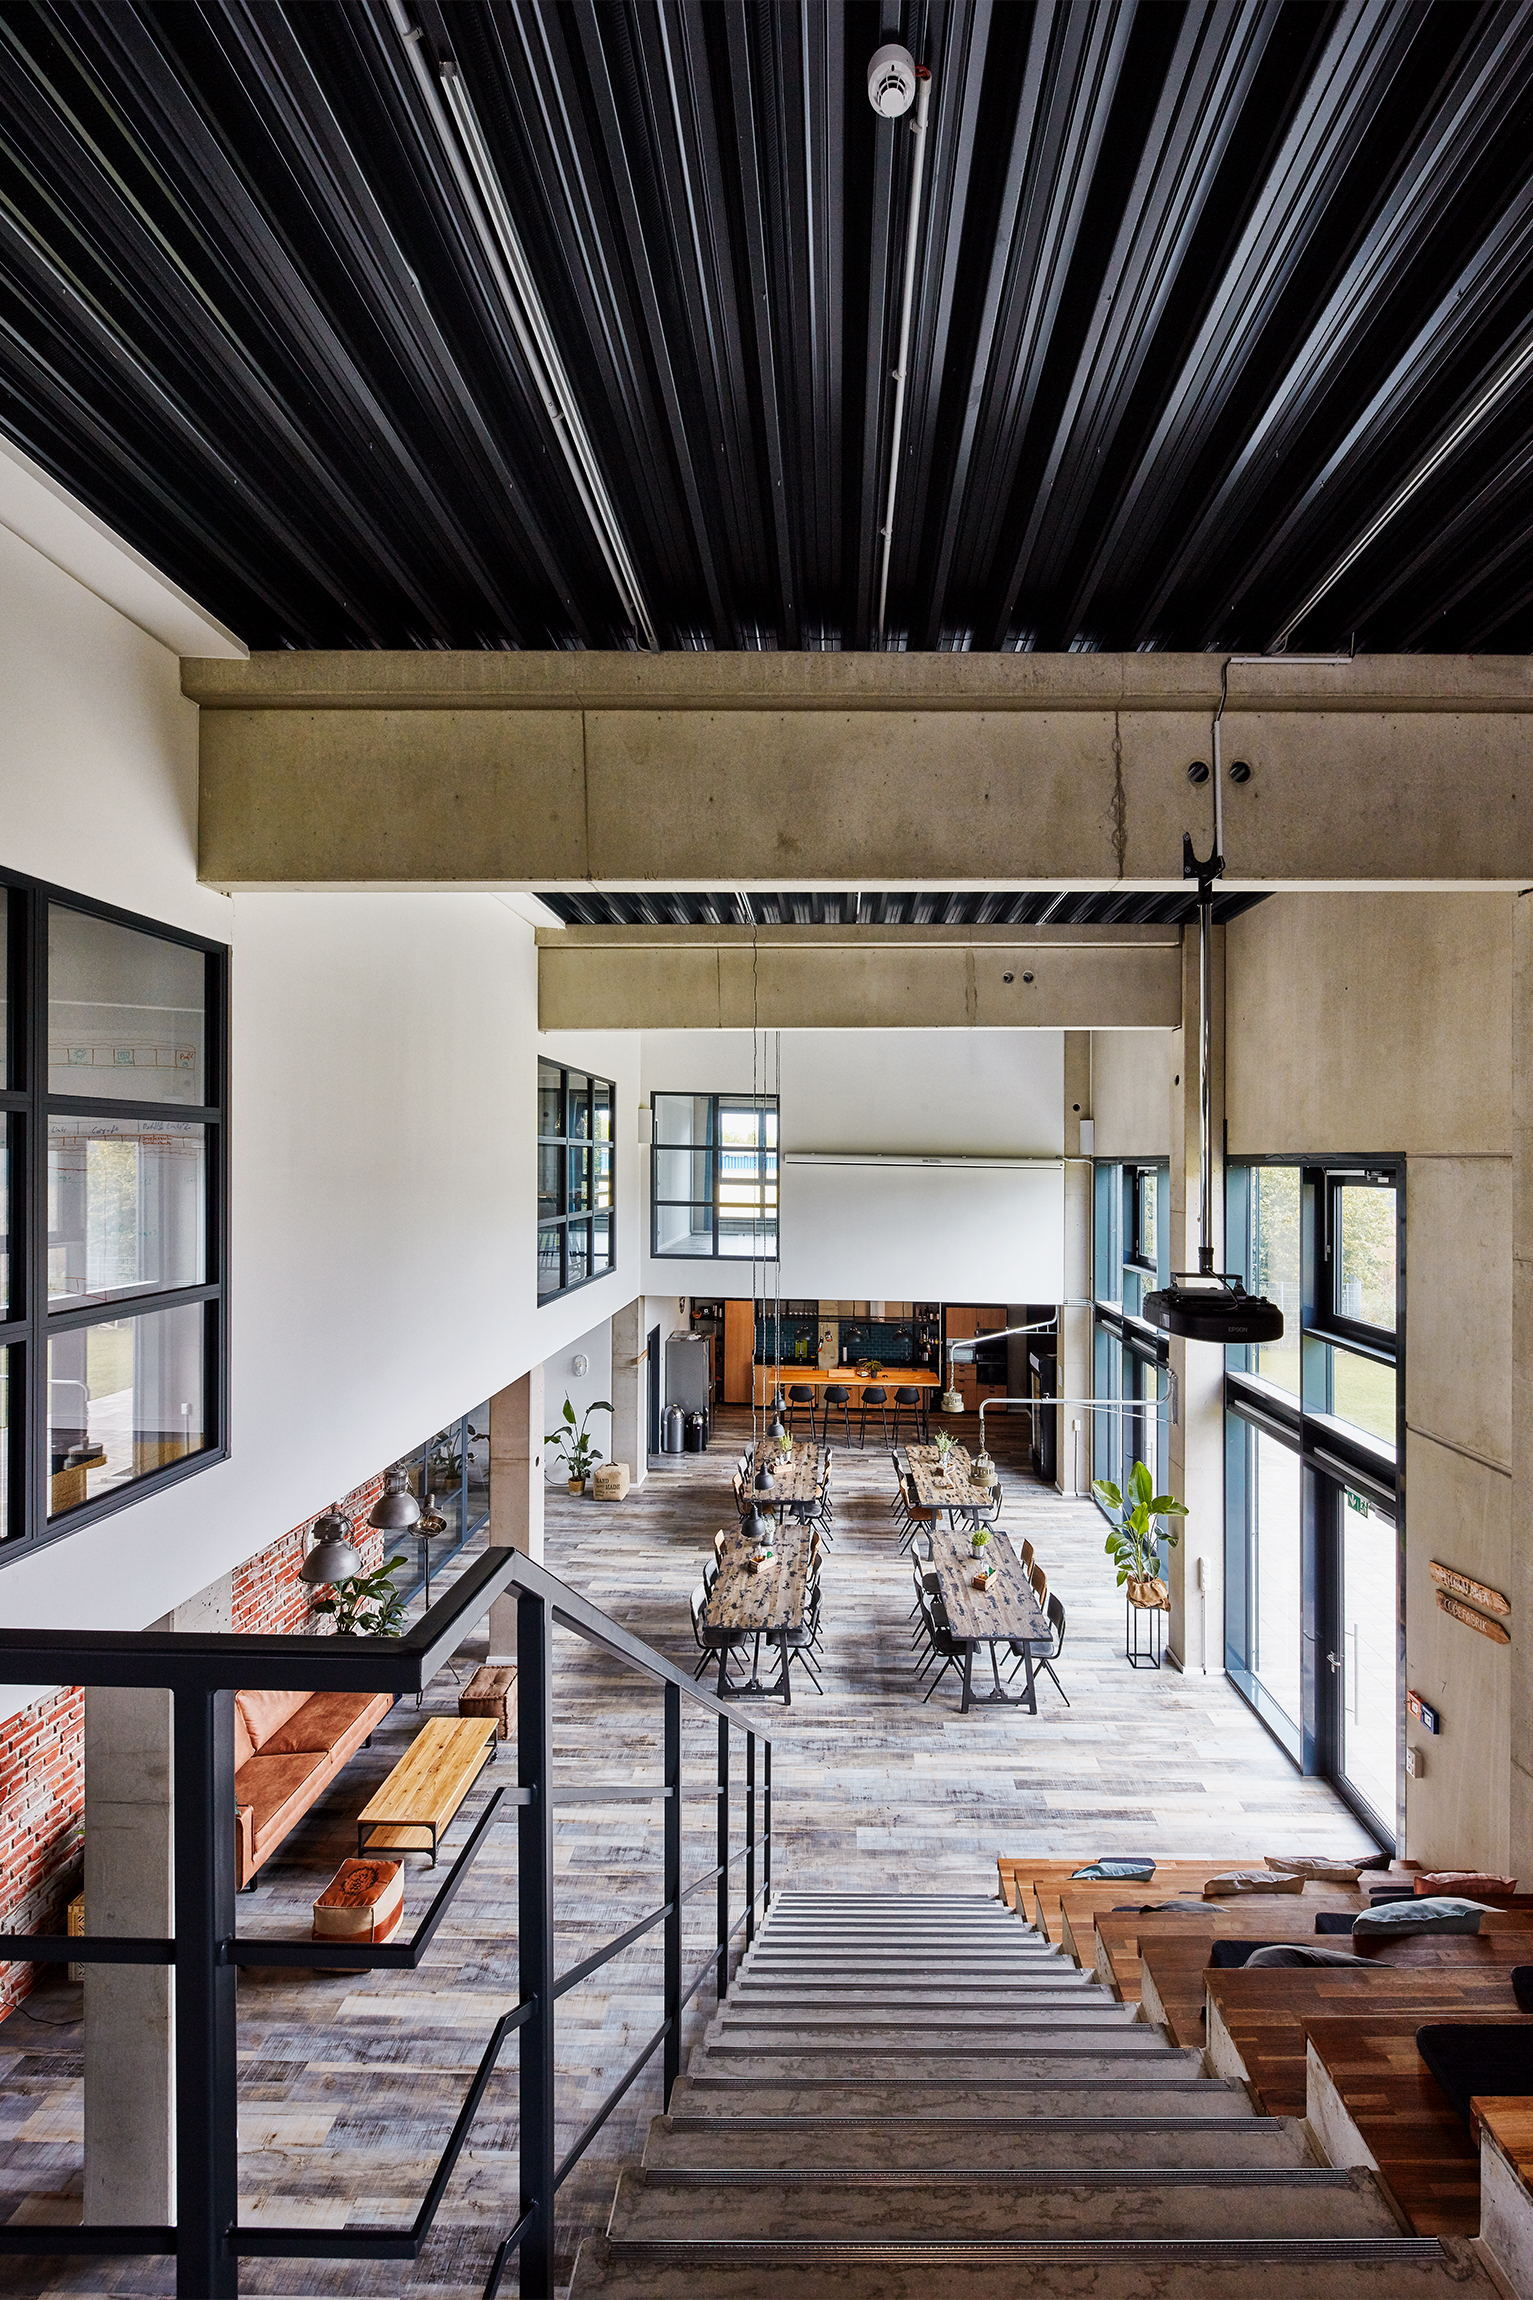 INTERAKTIV, Office Design, Bürogestaltung, Kreativer Arbeitsplatz, Industrial Design, Industrielles Design, Loft Office, Interior Design, Stil Manipulation 2020